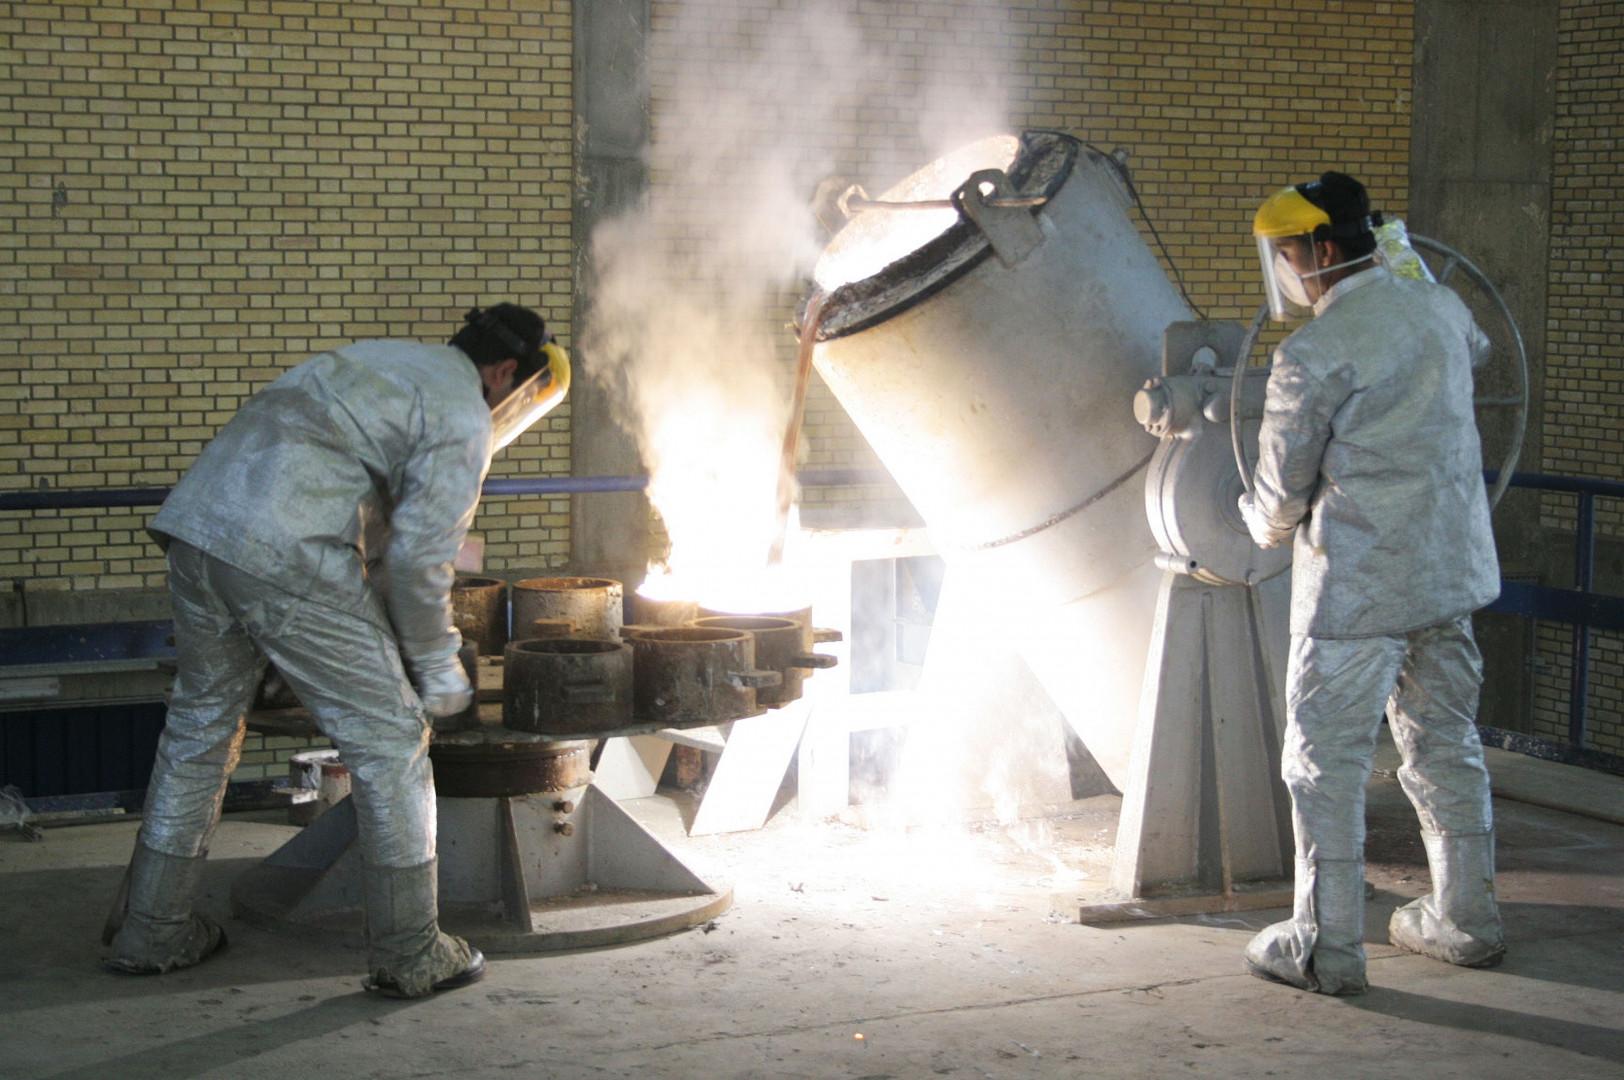 European powers warn Iran over the 60% Uranium enrichment move